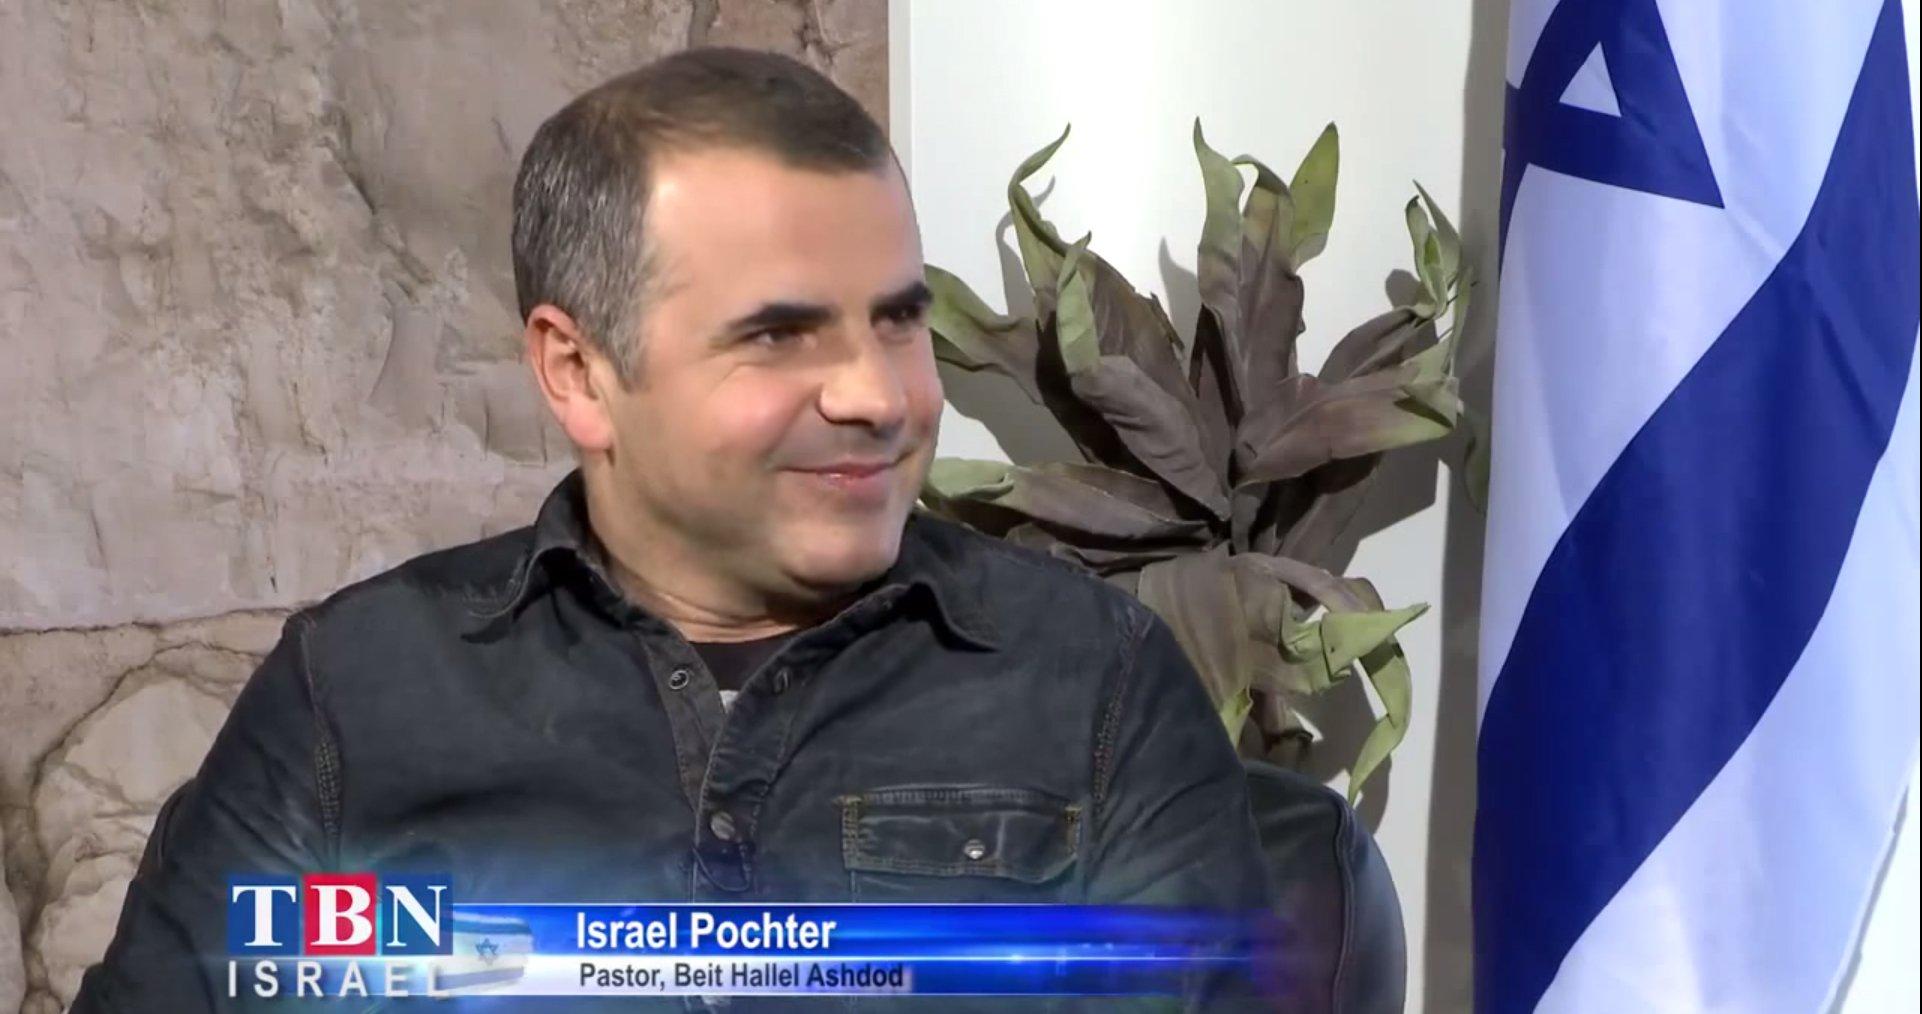 TBN Israel, Mati Shoshani interviews Israel Pochter